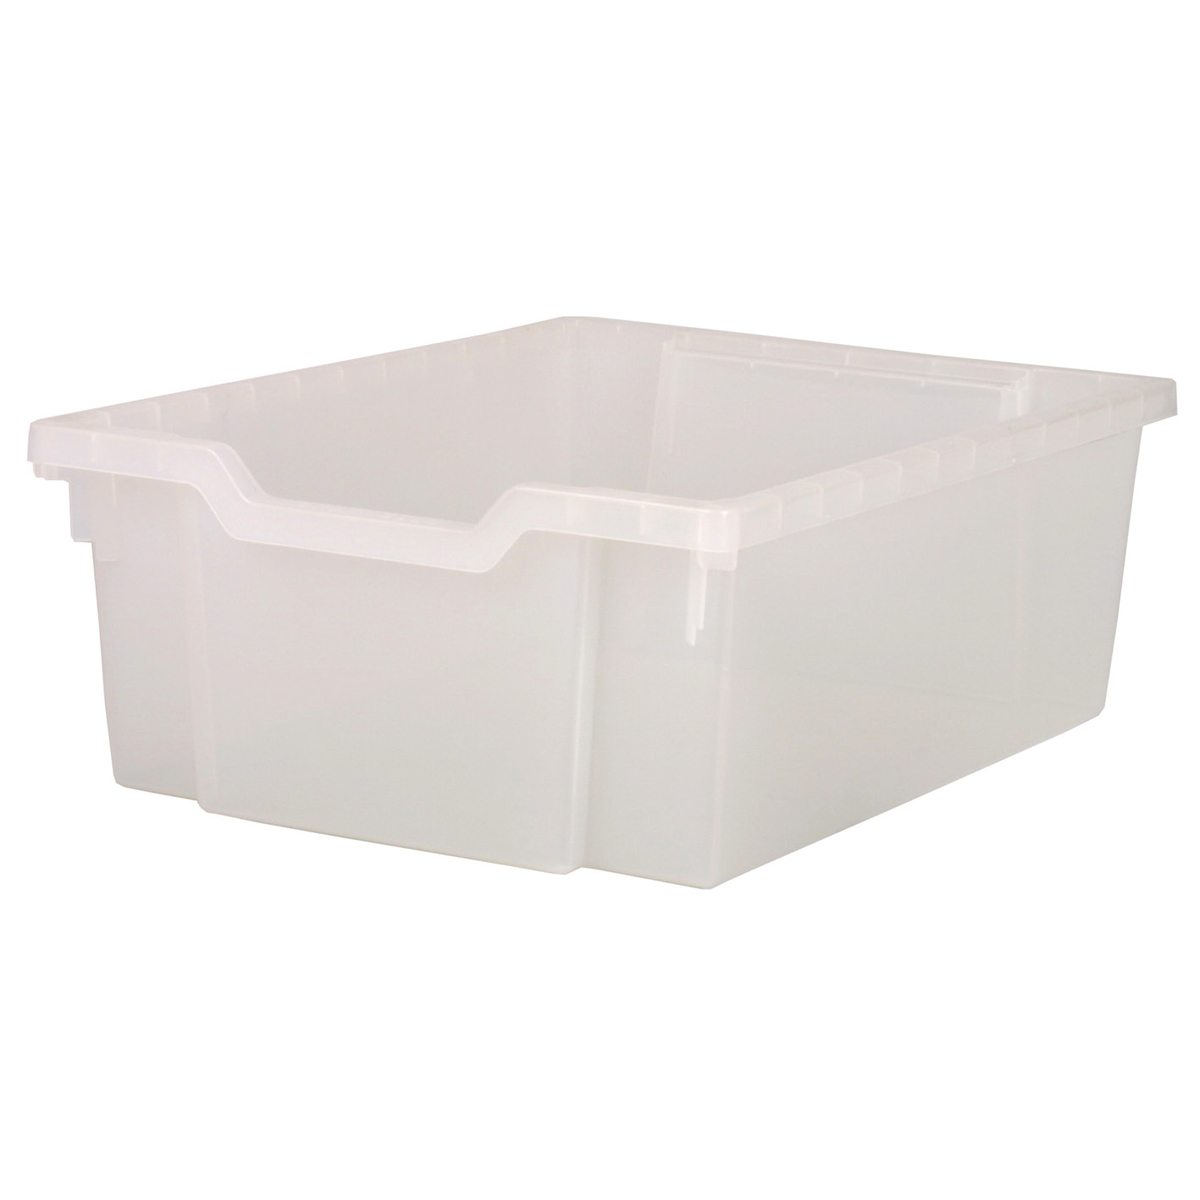 Deep plastic tray